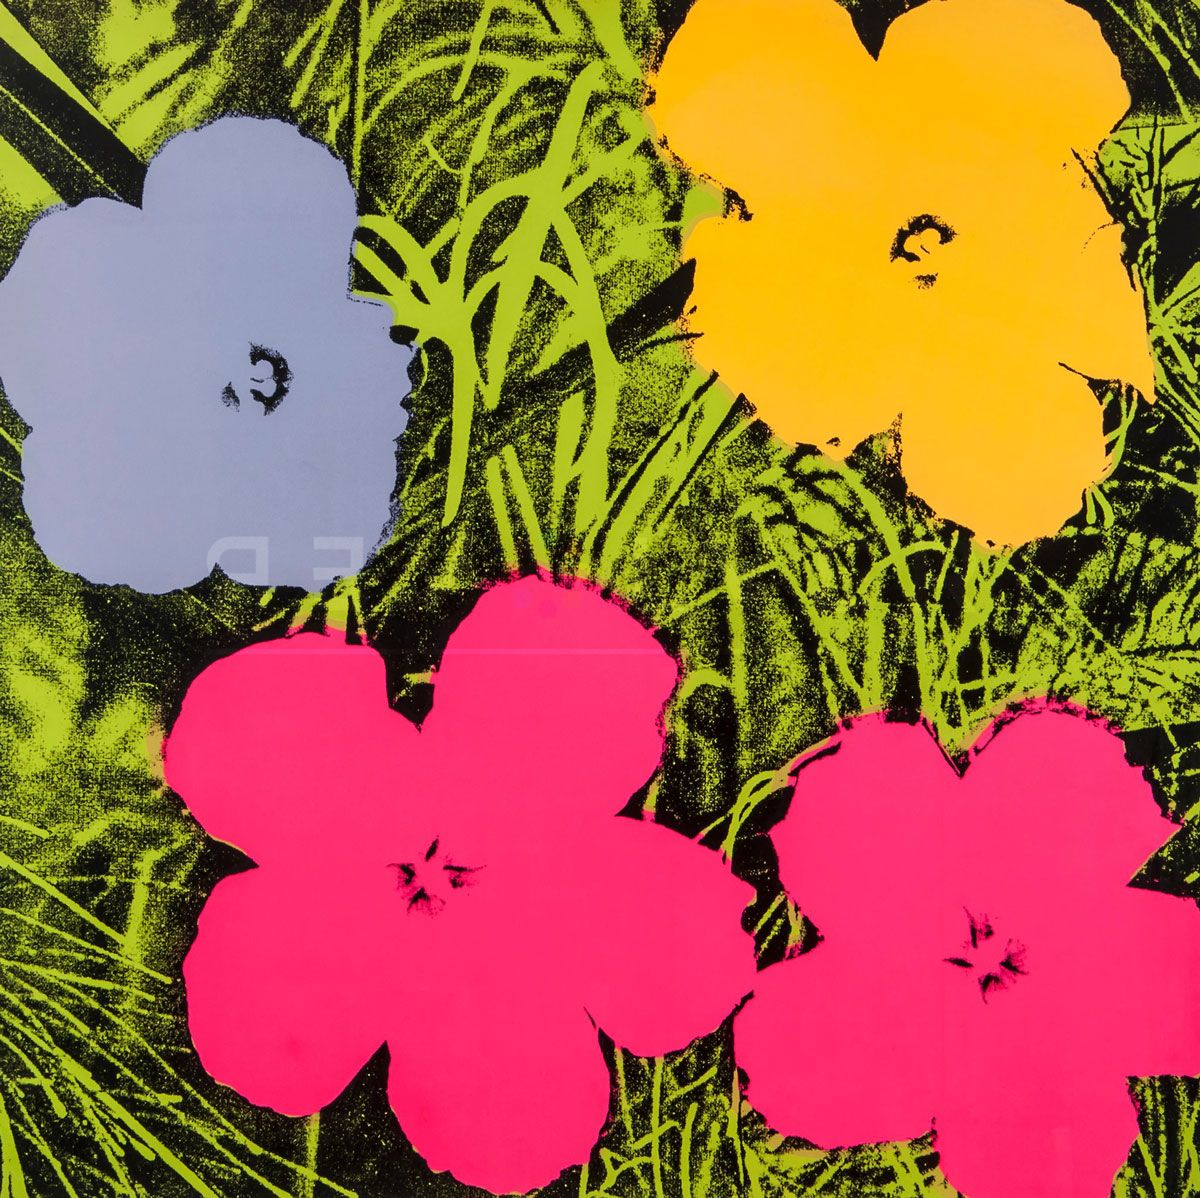 Fiori Warhol.Flowers 73 Print By Andy Warhol Arte Del Fiore Dipingere Fiori